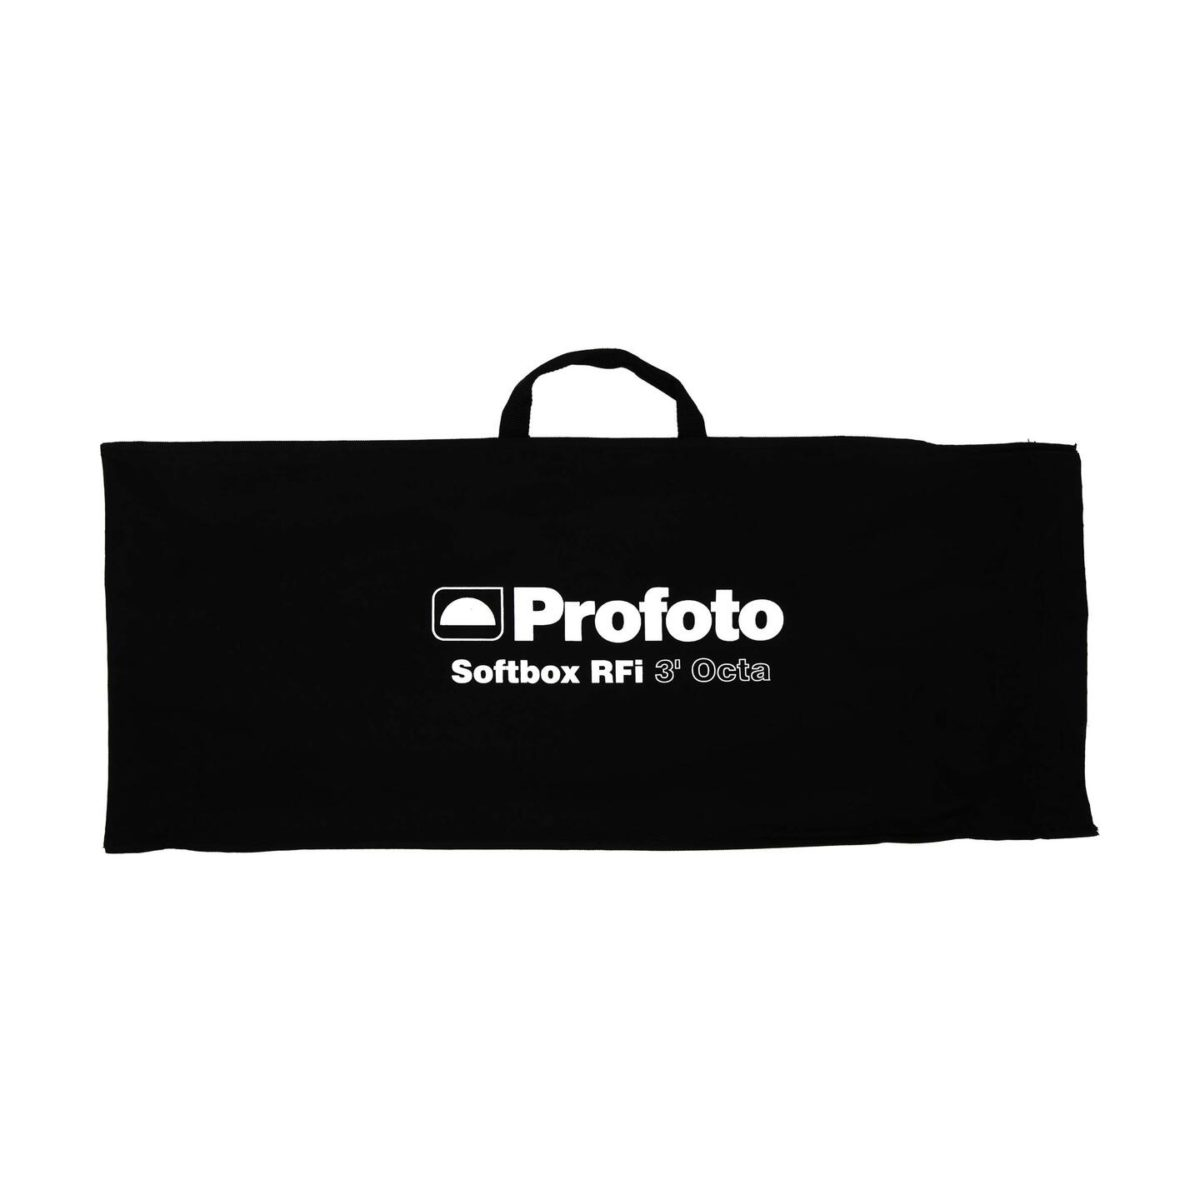 profoto_rfi_softbox_3_octa_05